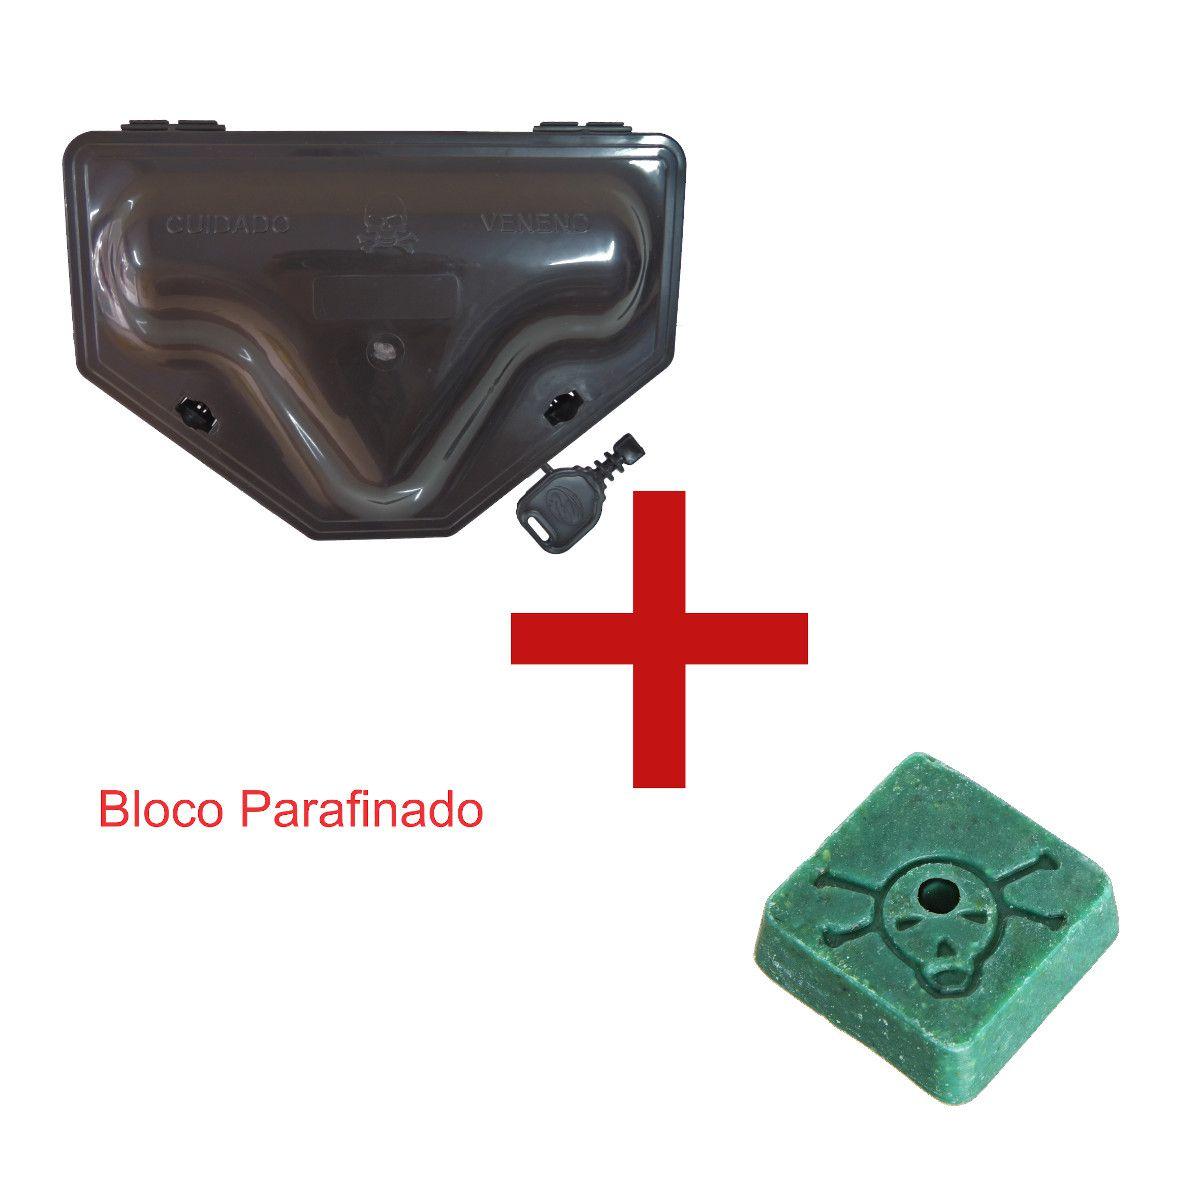 KIT 30 Porta Iscas Armadilha Pega Ratos 2 TRAVAS c/ Chave